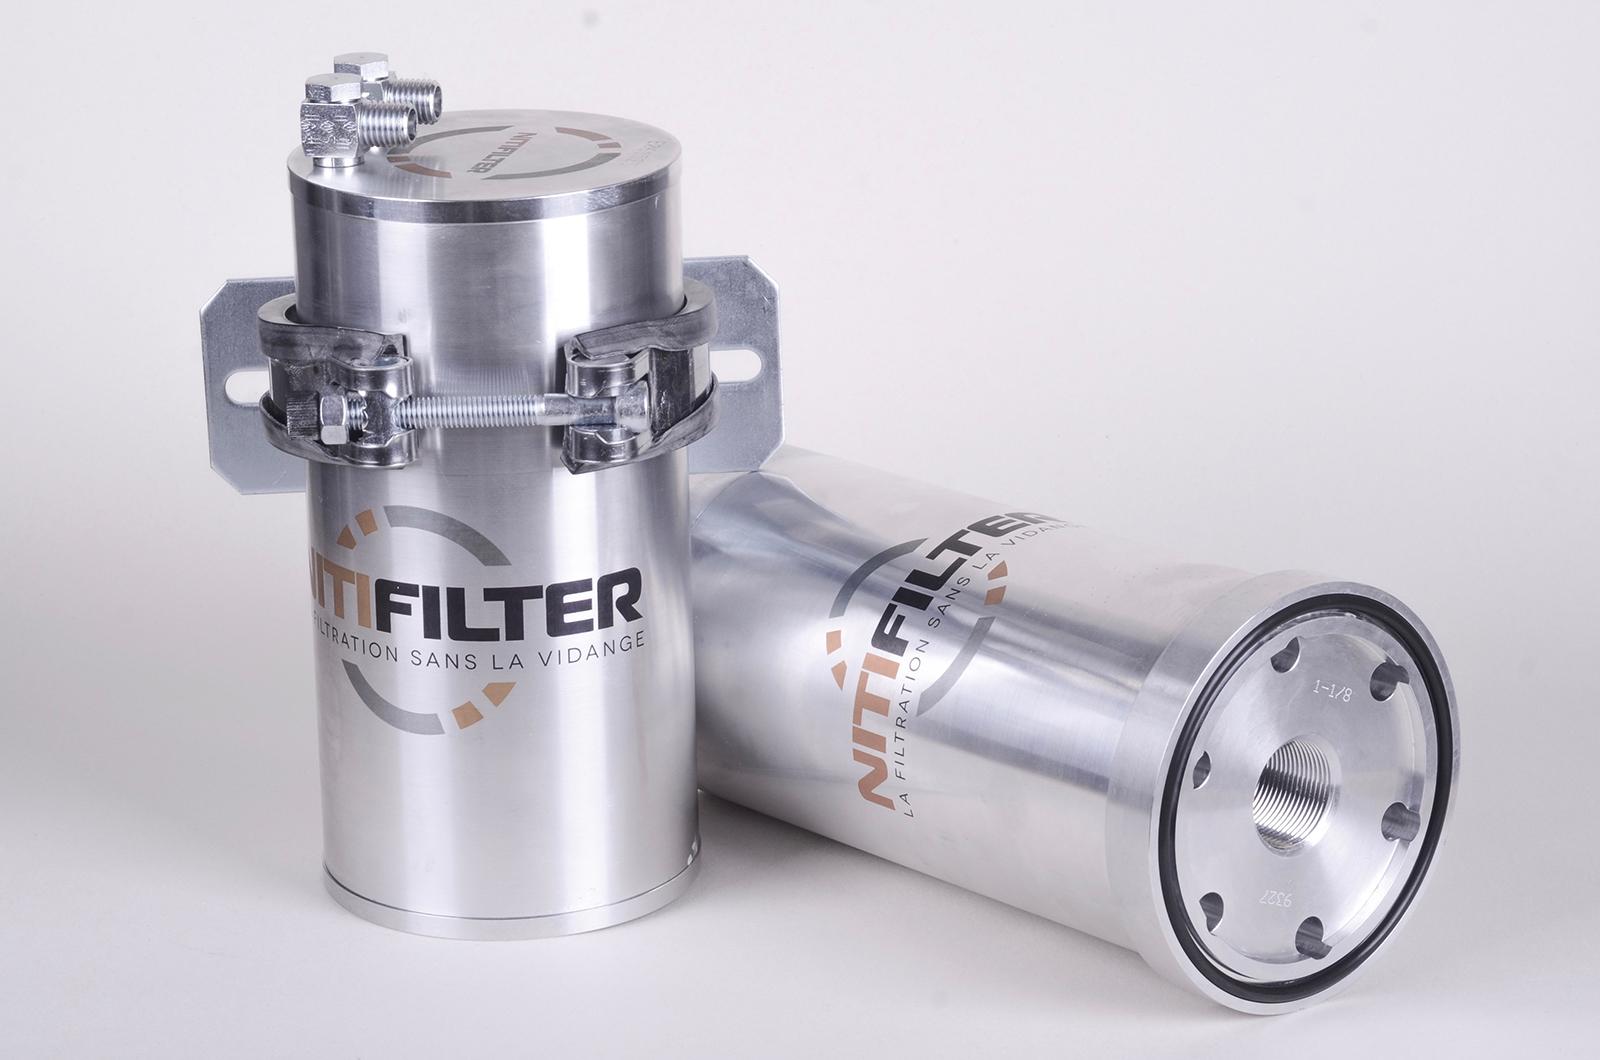 filtre nitifilter